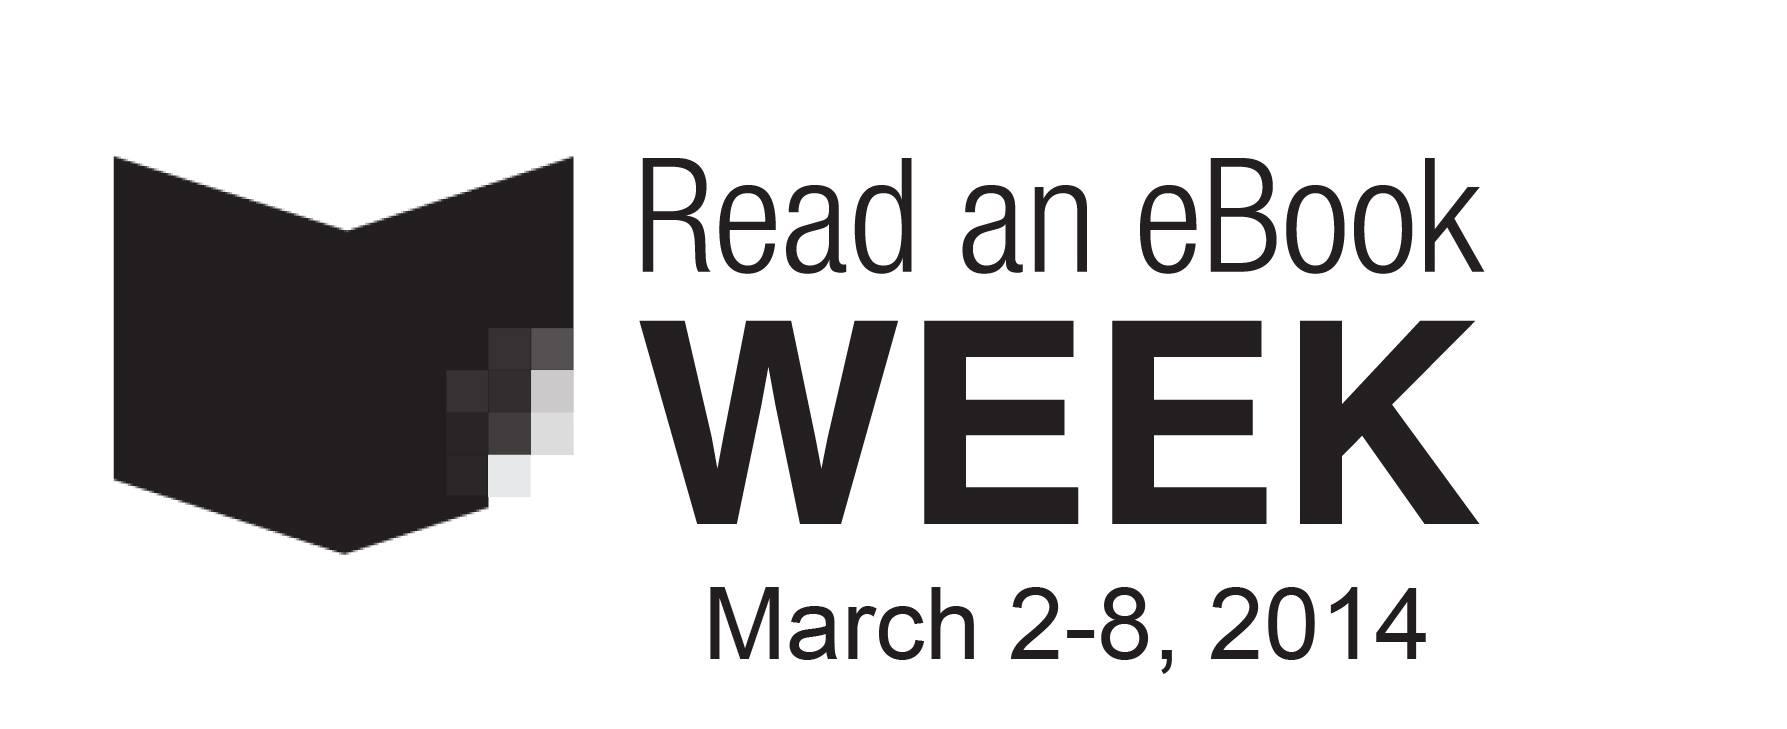 Read an Ebook Week 2014